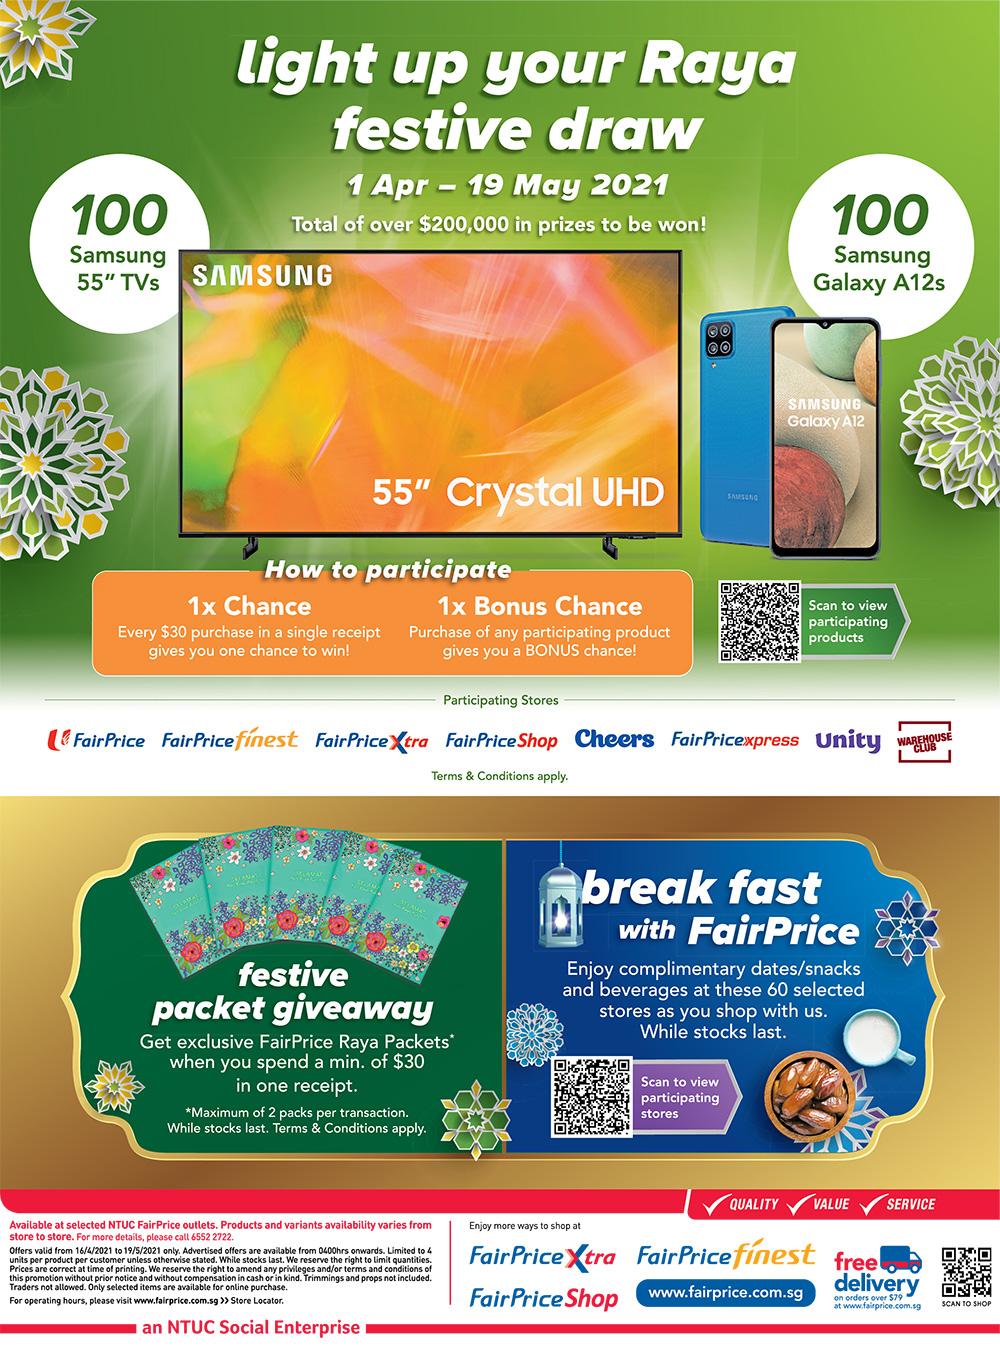 FairPrice Hari Raya Catalogue 2021 - Page 8